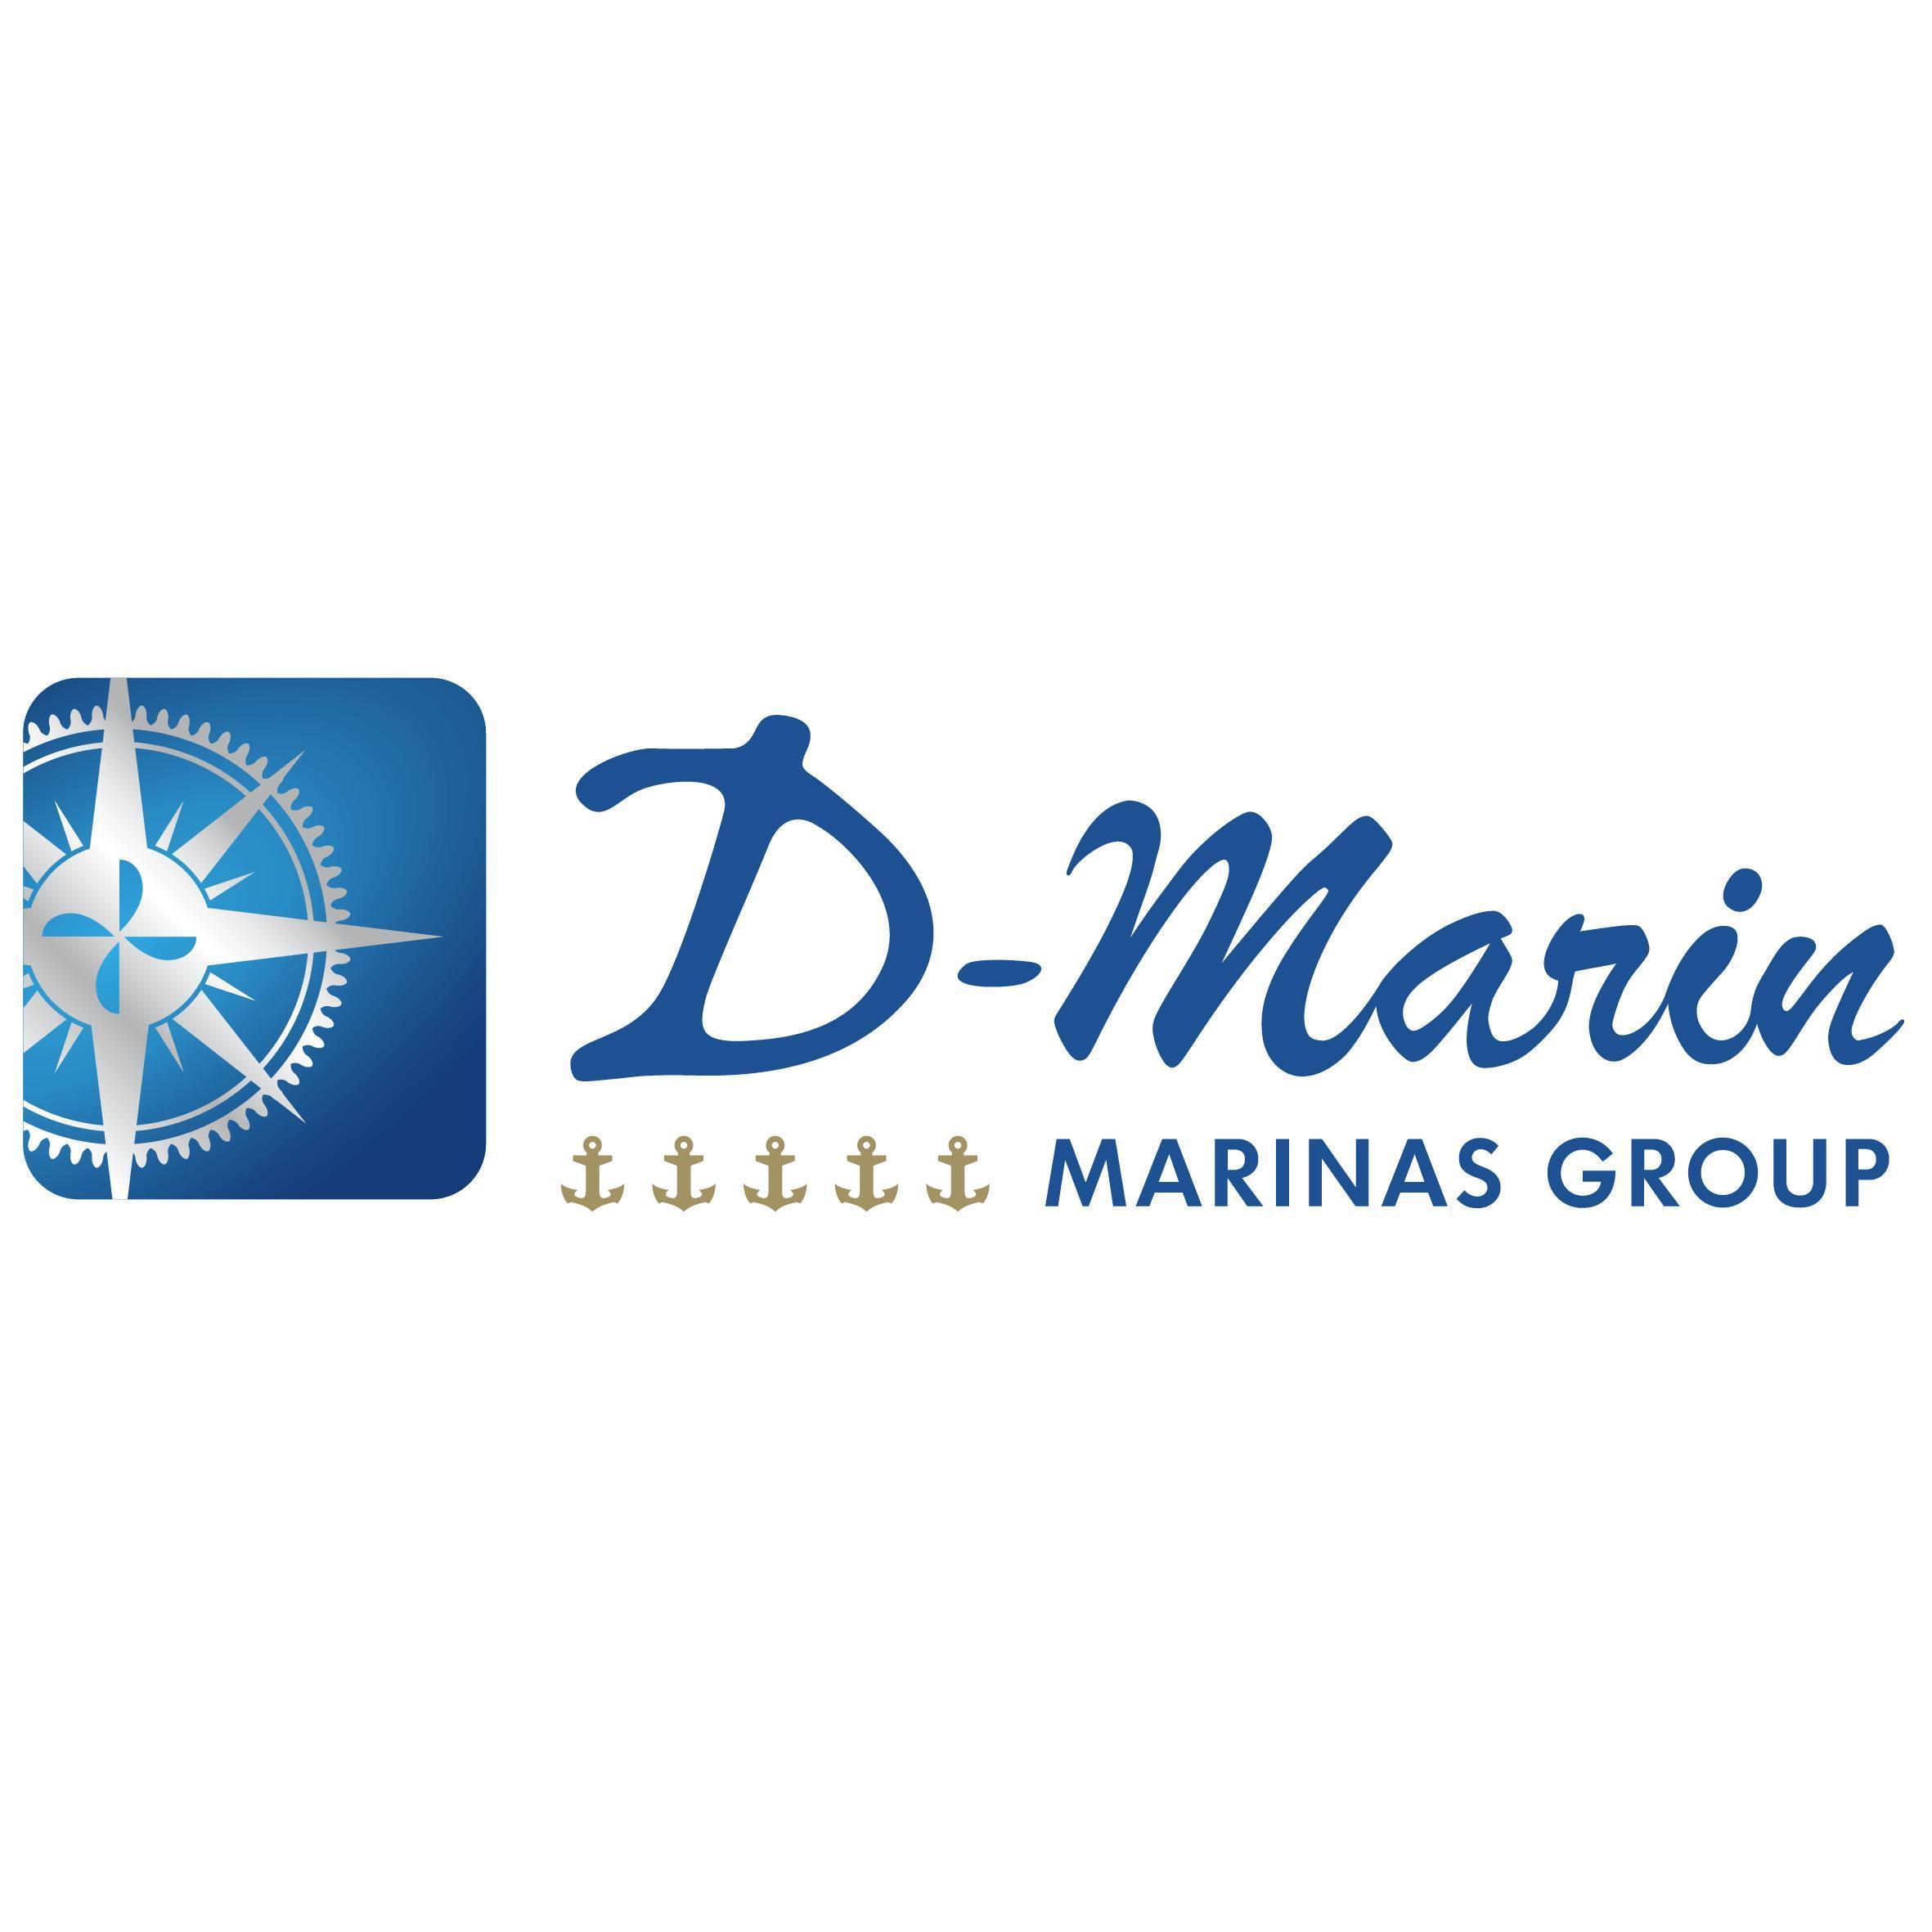 D-Marin Group (@DMarinGroup) | Twitter